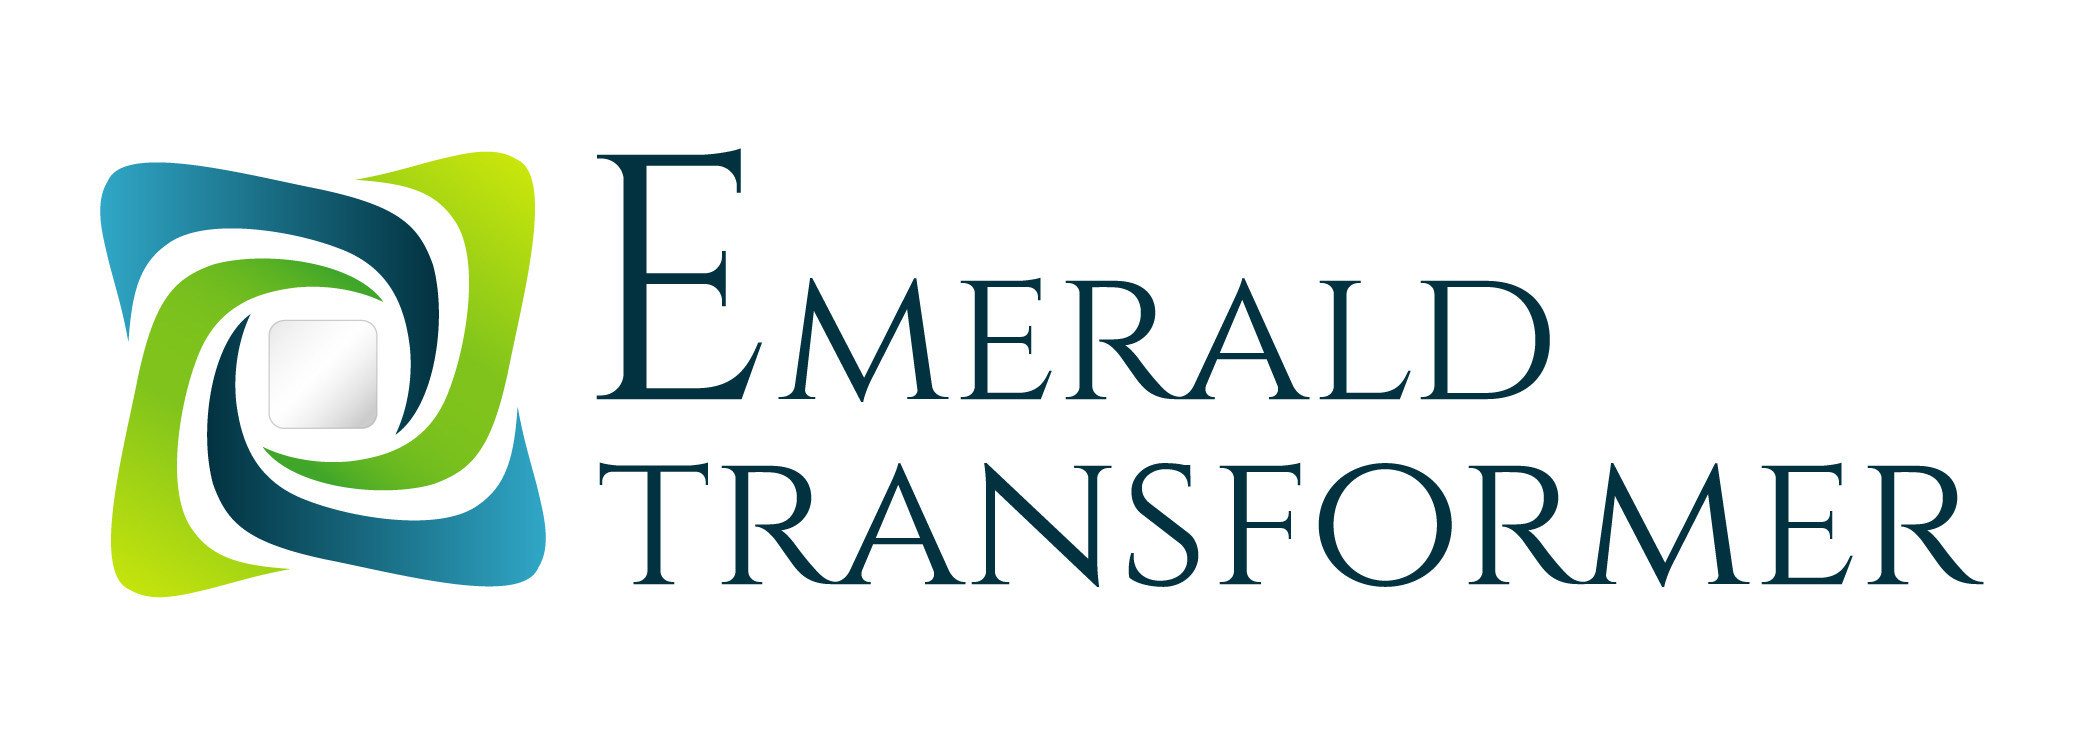 www.emeraldtransformer.com (PRNewsfoto/Emerald Transformer)